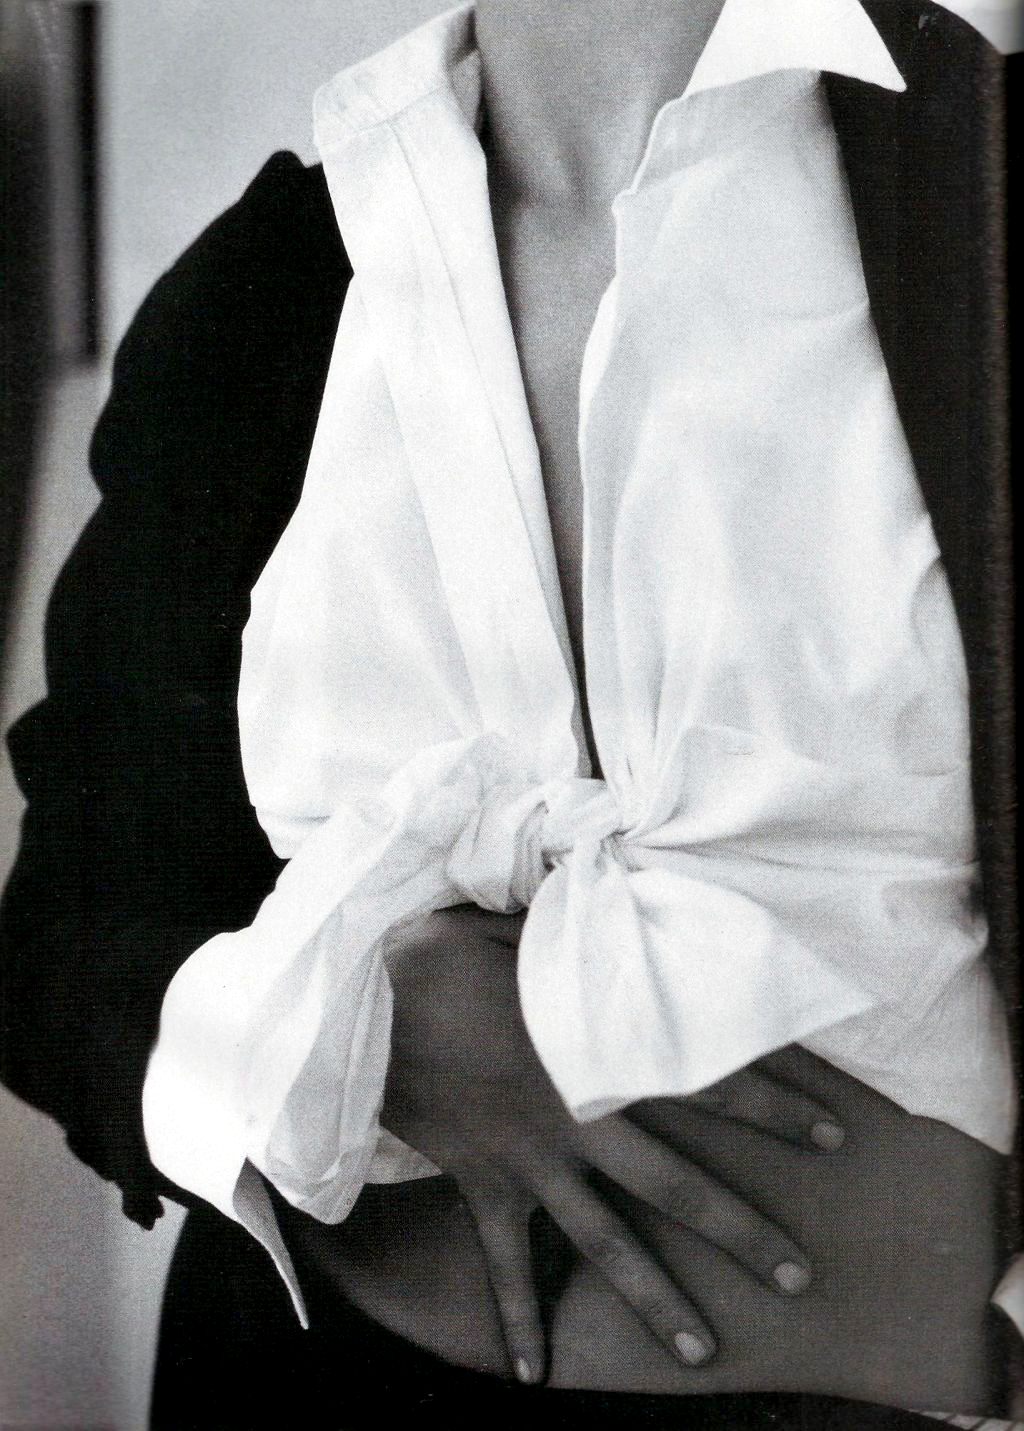 Mode seduction / Elle France January 1990 (photography: Pamela Hanson, styling: Carine Roitfeld, model: Dana Patrick) / white shirt in fashion editorials / short history of white shirt / wardrobe essentials / via fashioned by love british fashion blog